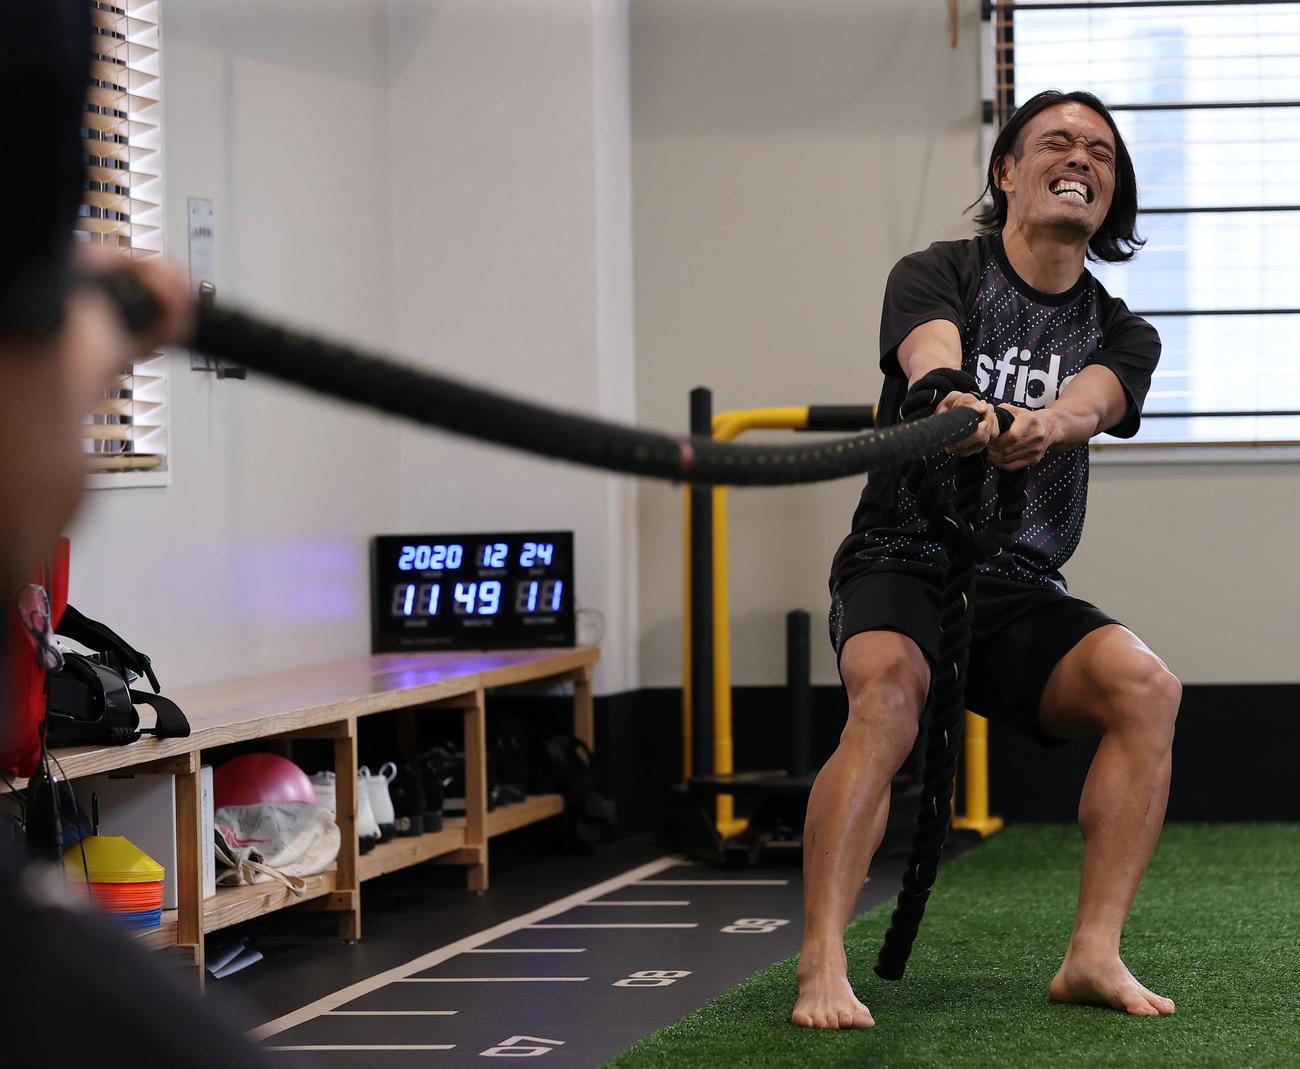 Jリーガーから格闘家へ転身後の初練習で汗を流す安彦